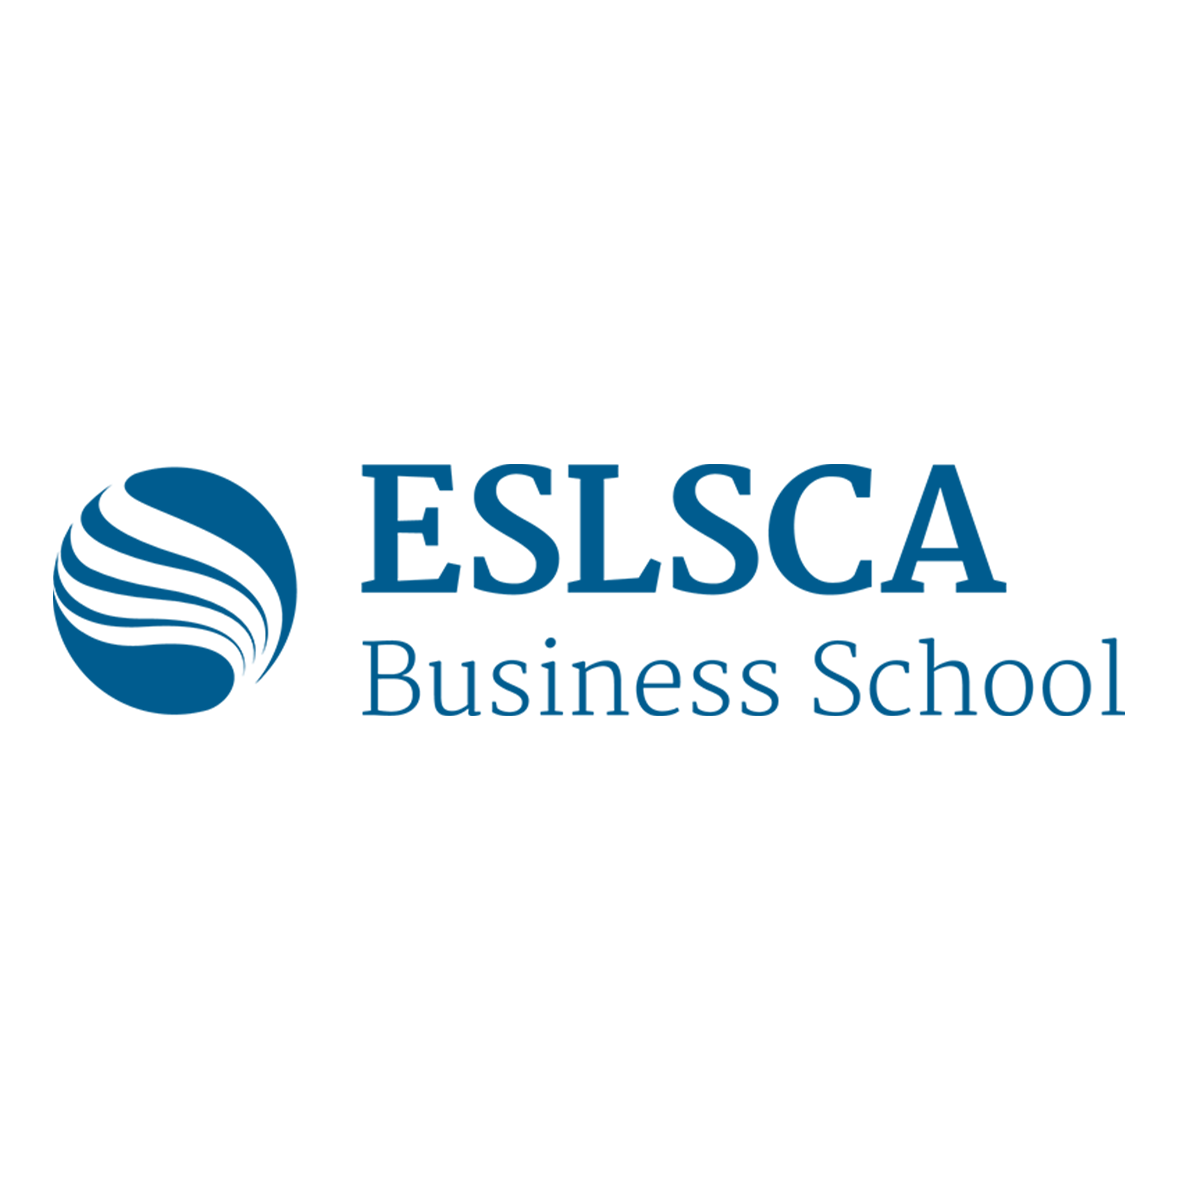 ESLSCA logo